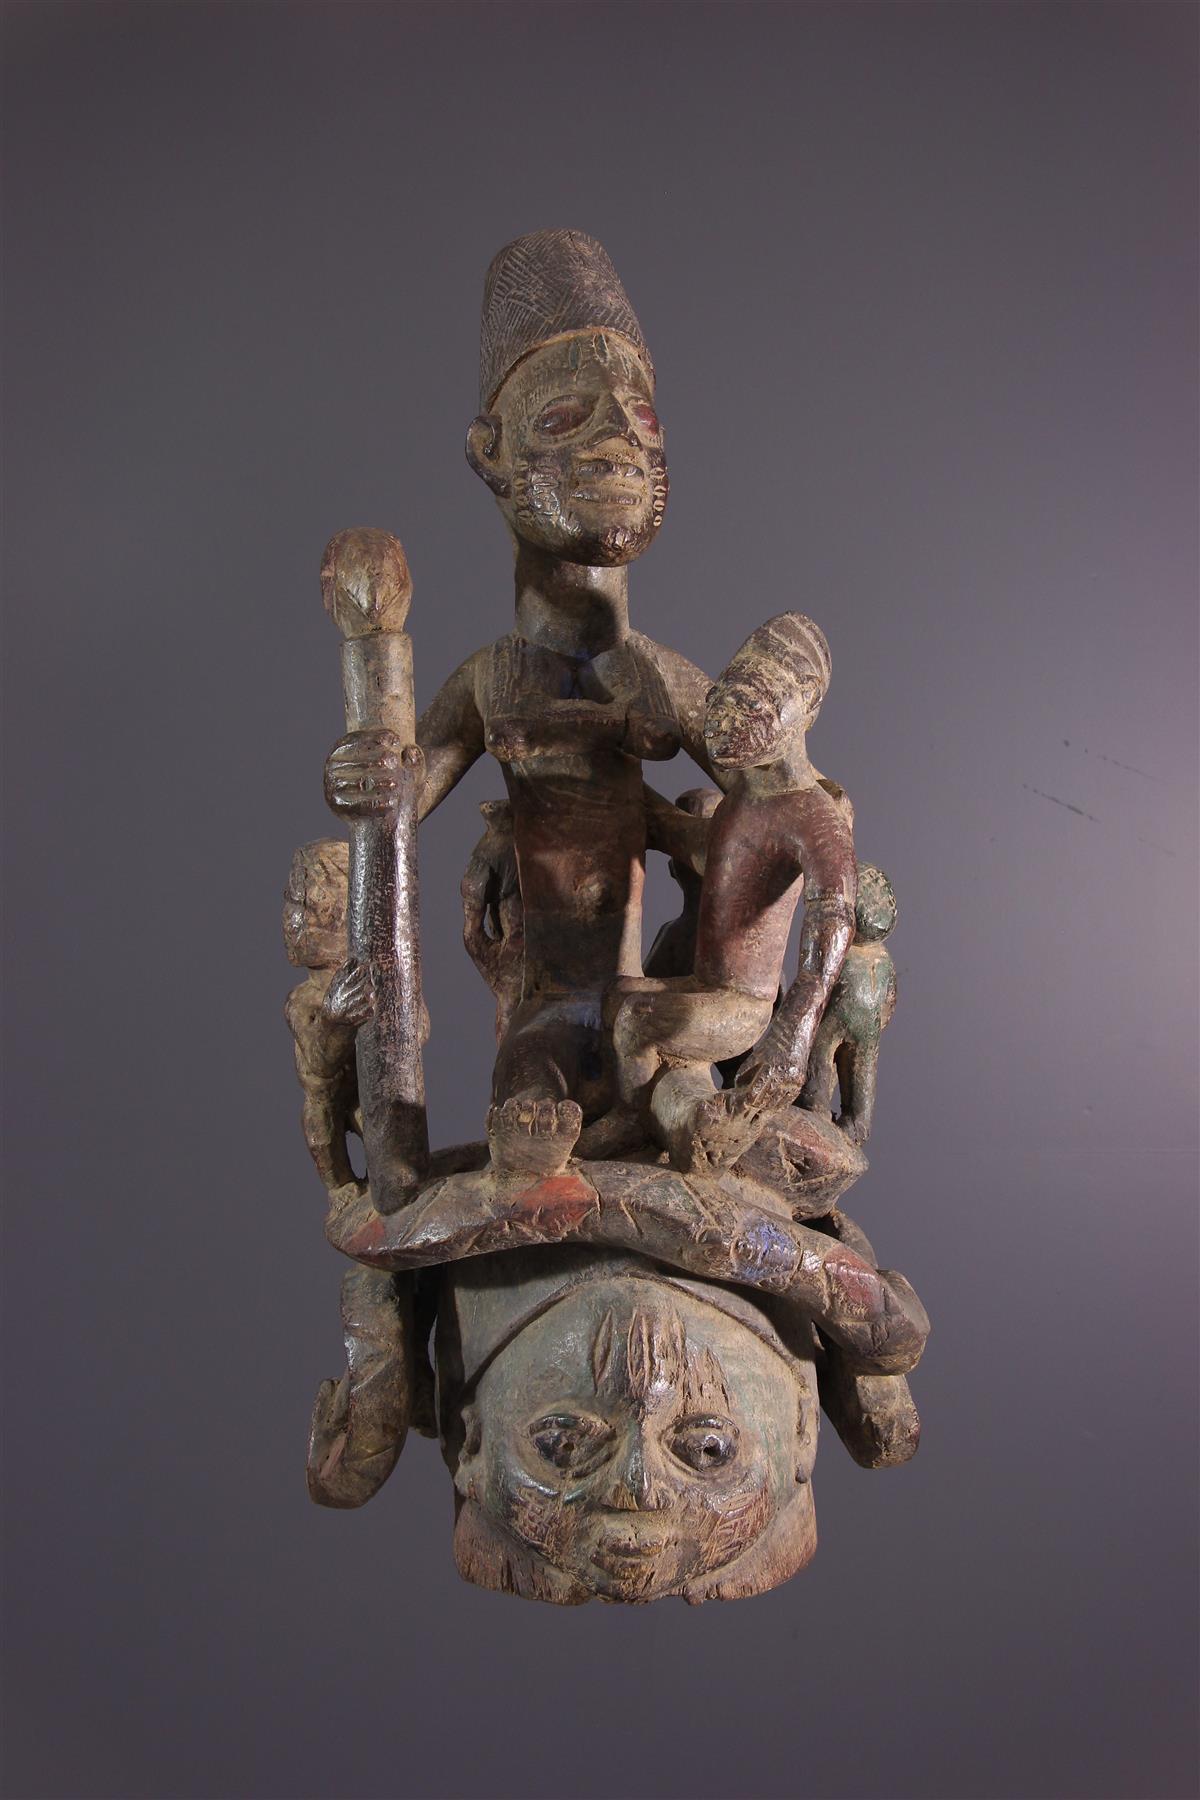 Masque Gélédé - Art africain